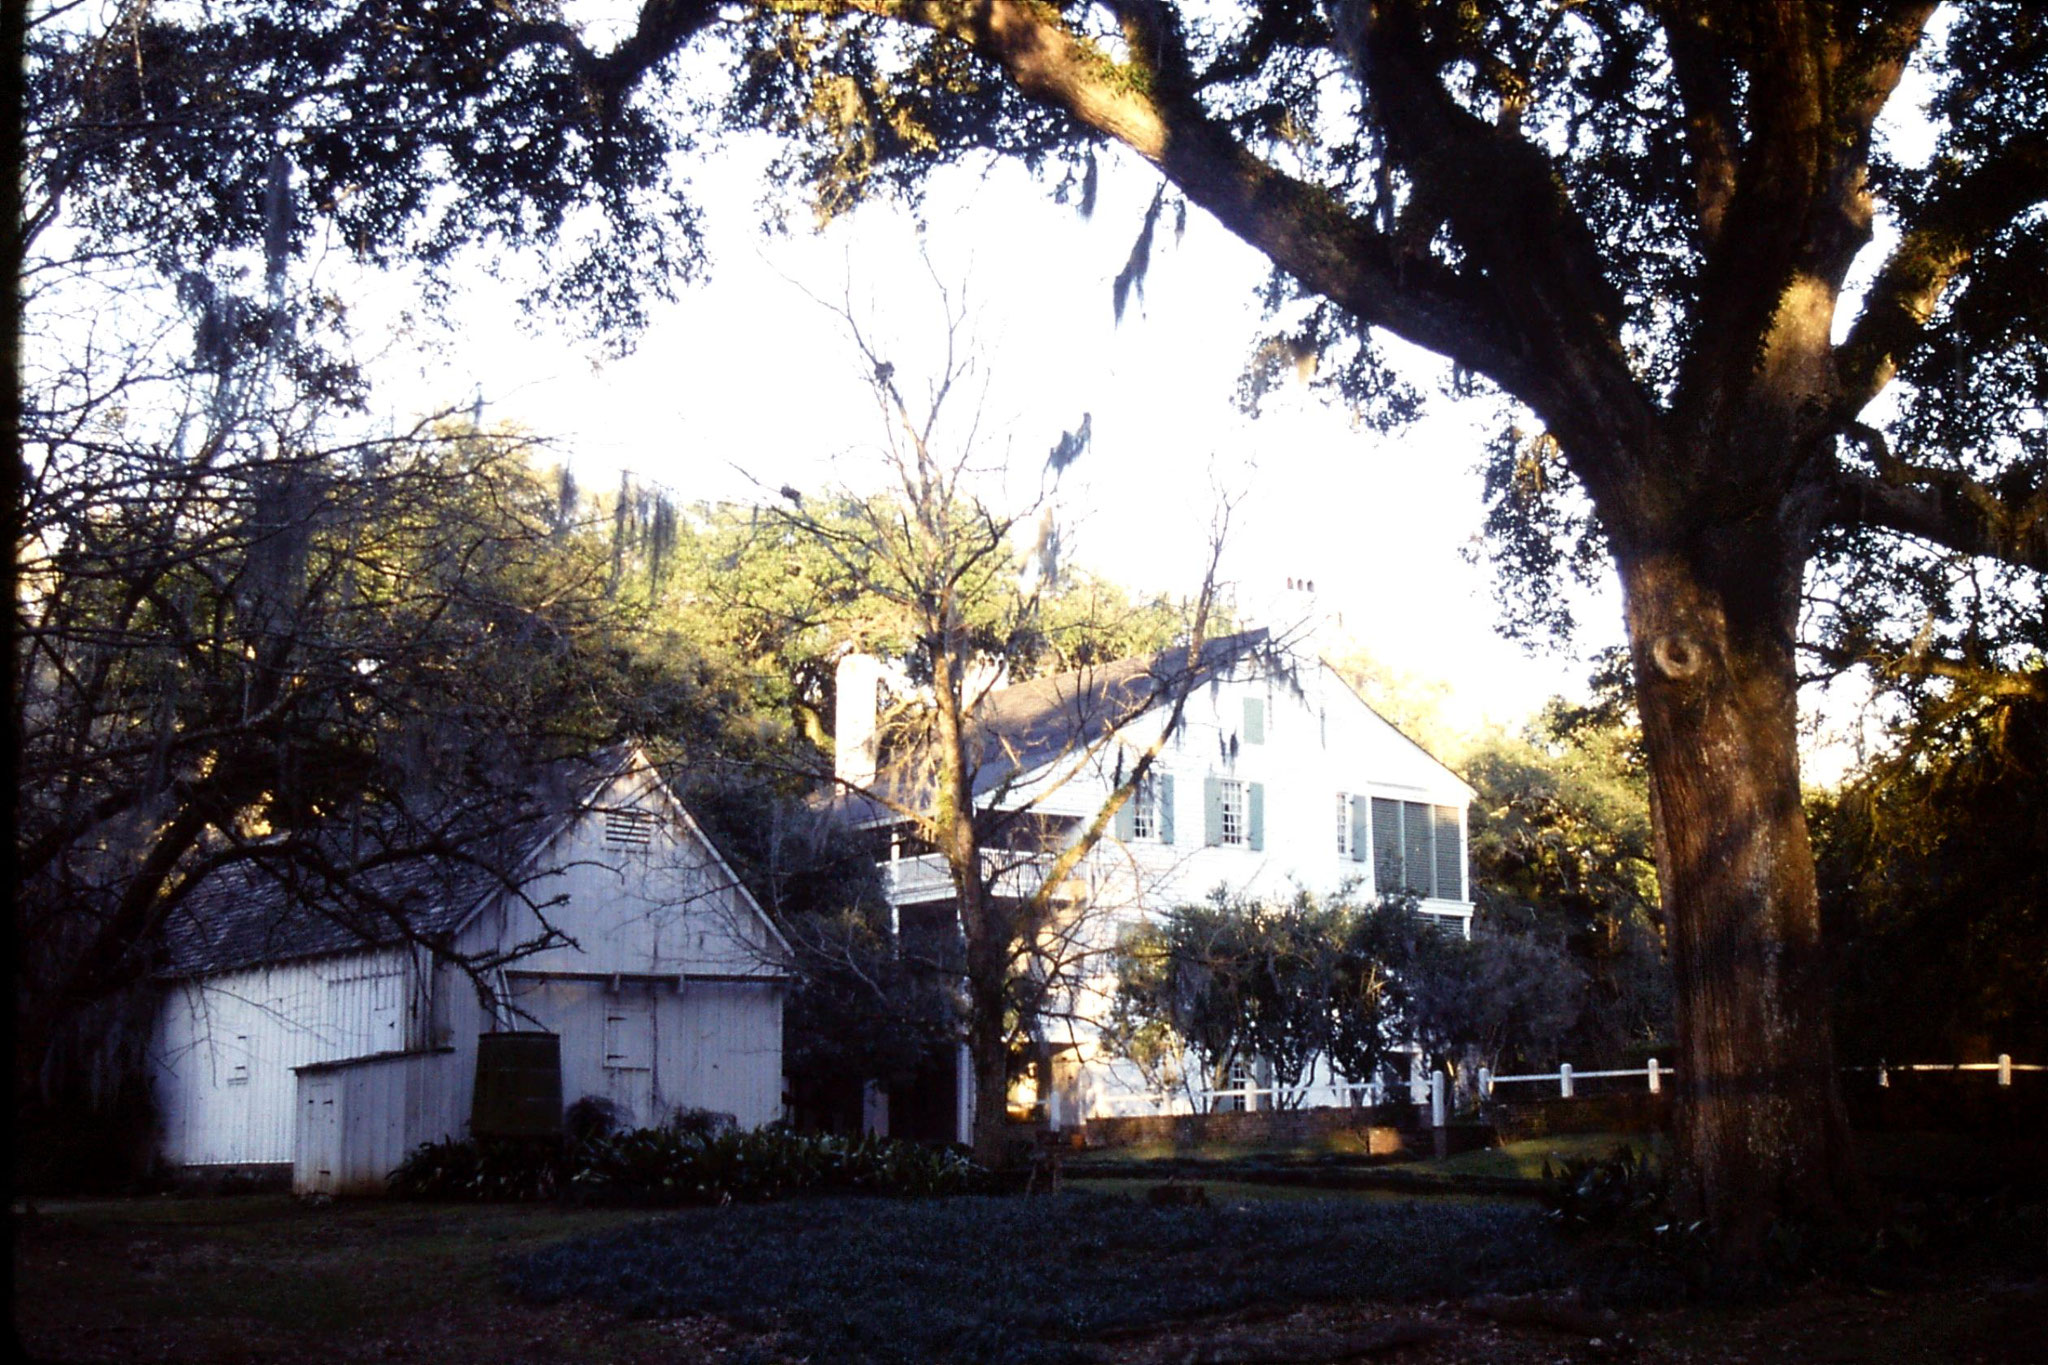 14/1/1991: 0: Audubon House